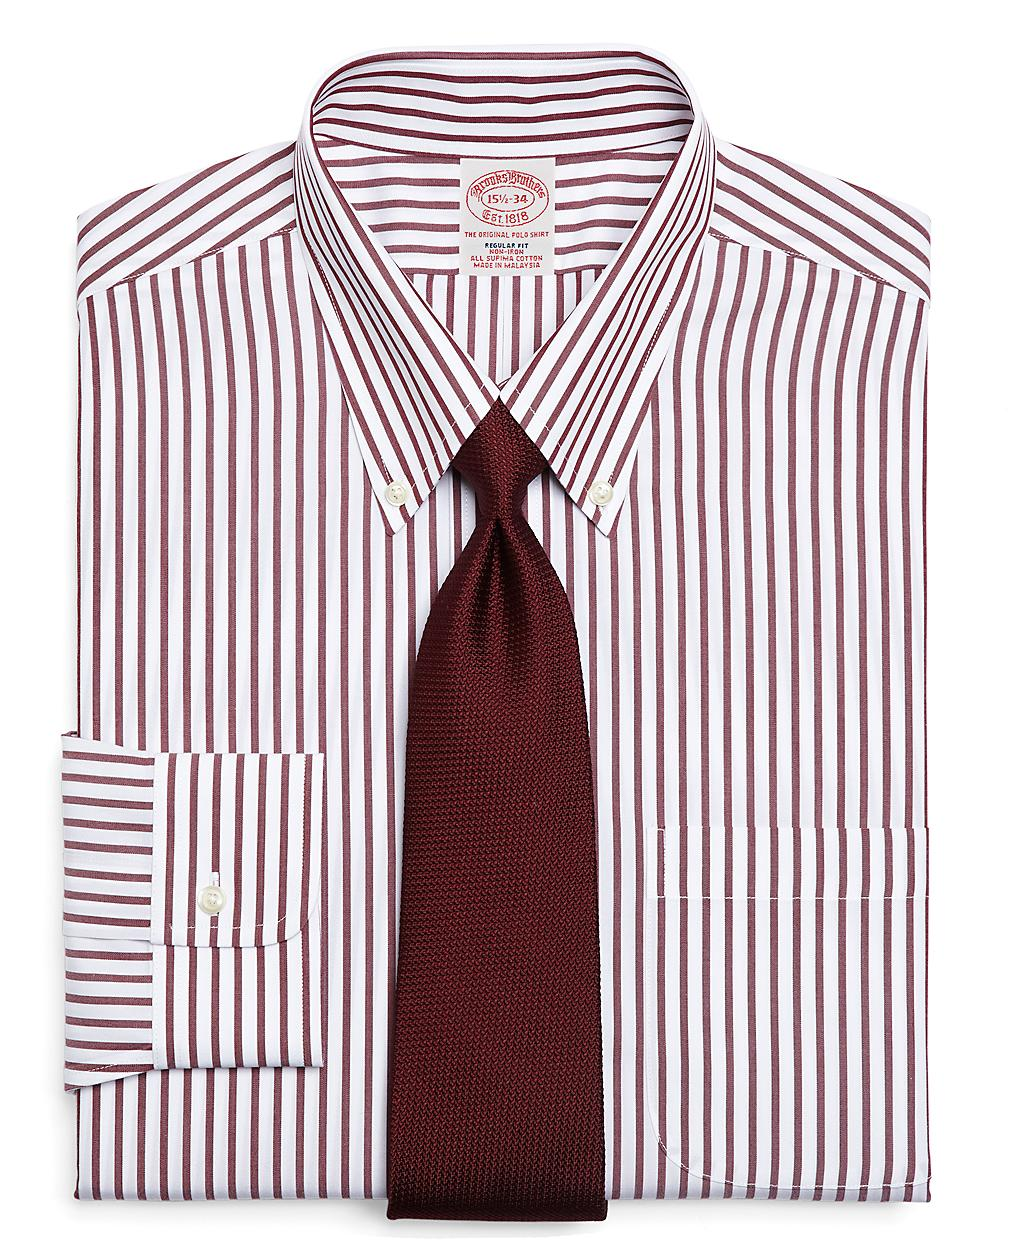 Lyst Brooks Brothers Supima Cotton Noniron Regular Fit